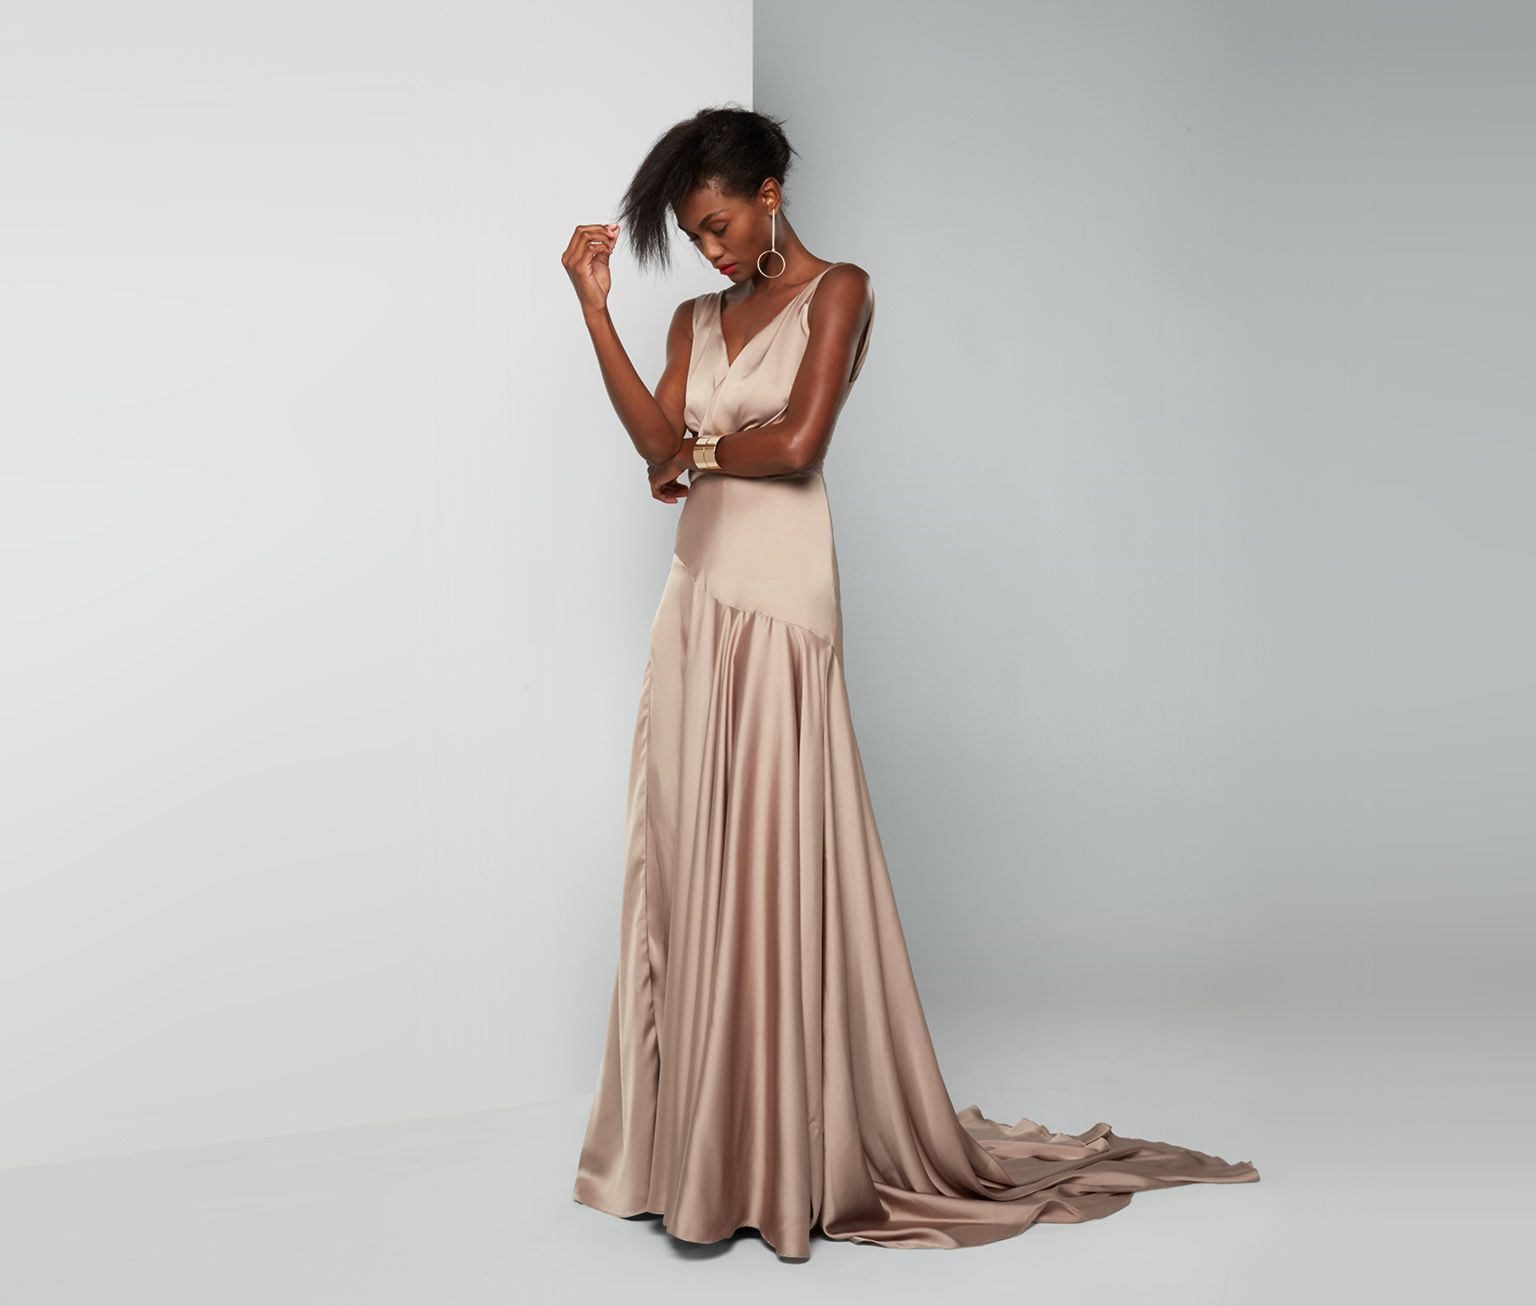 Dark Tan Escala Dress | Fame & Partners USA | Clothes and Home Decor ...